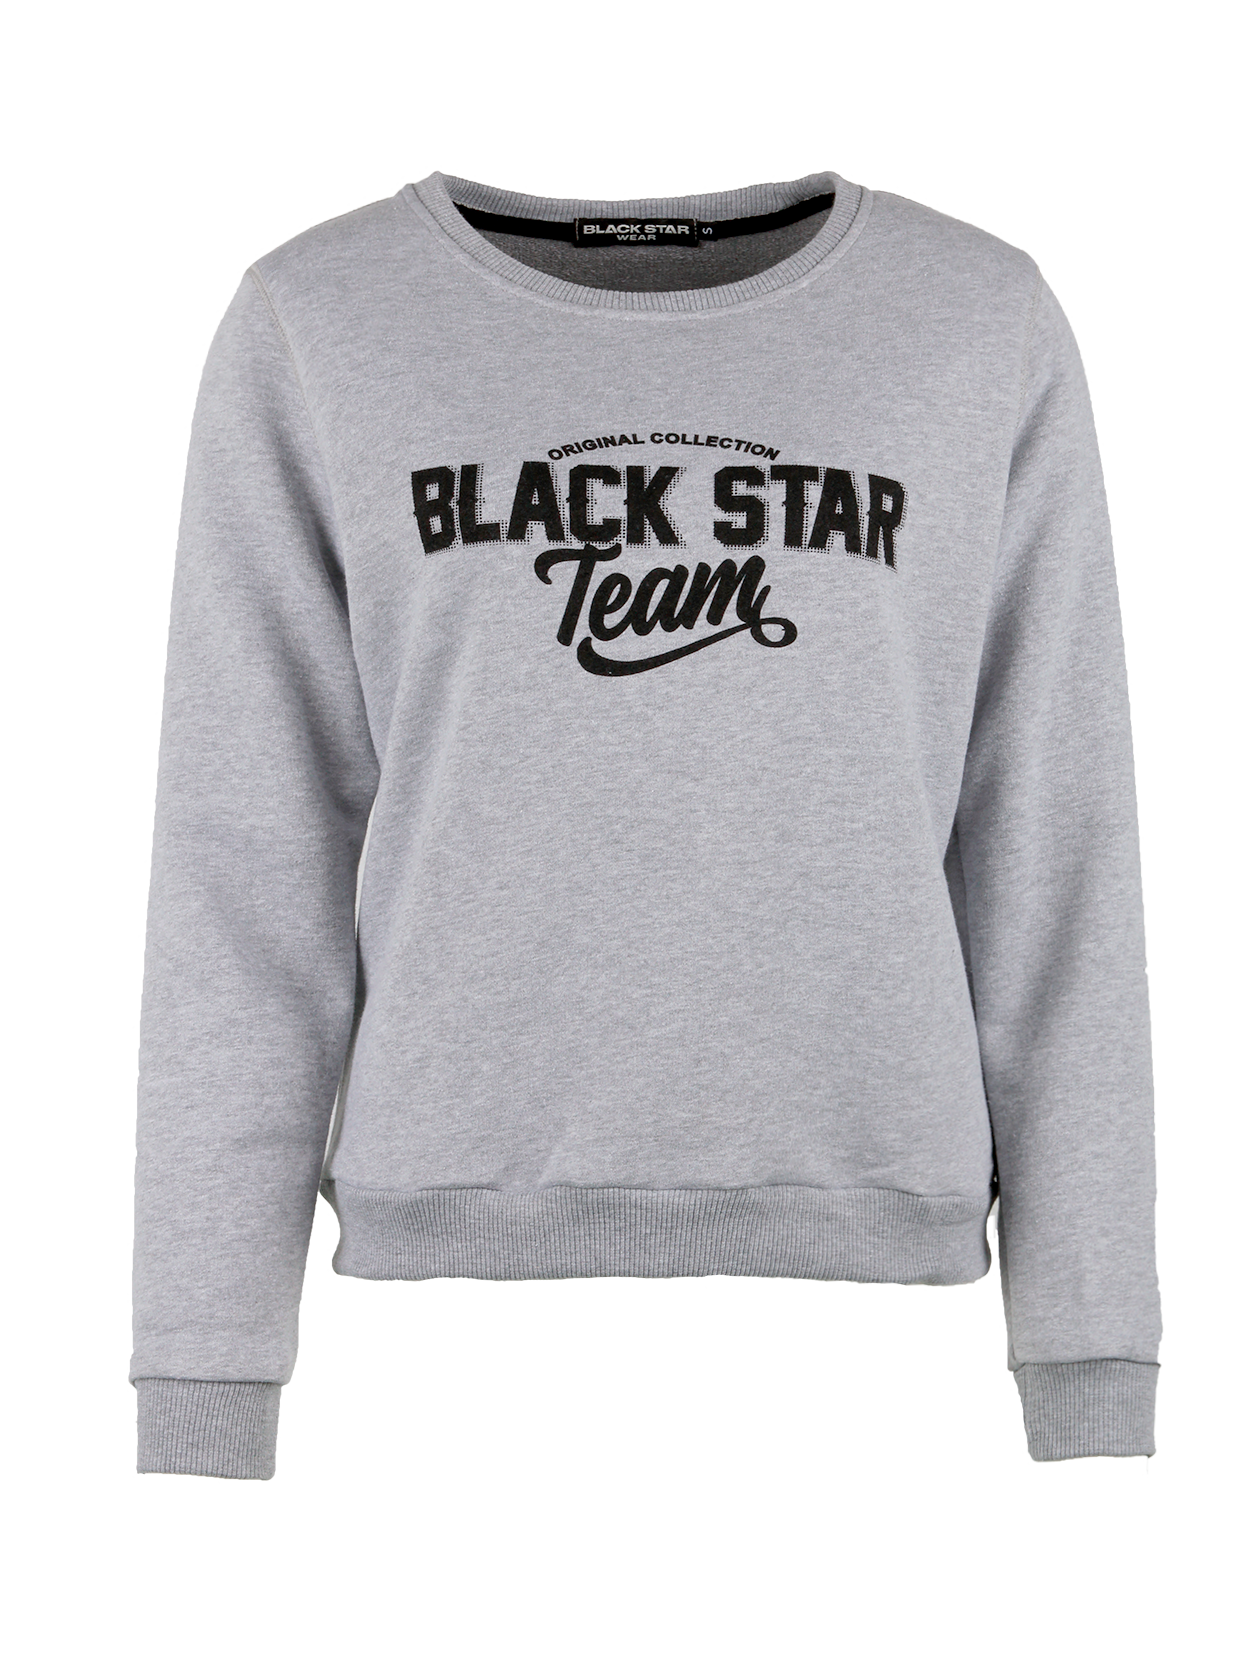 Костюм спортивный женский Black Star Team